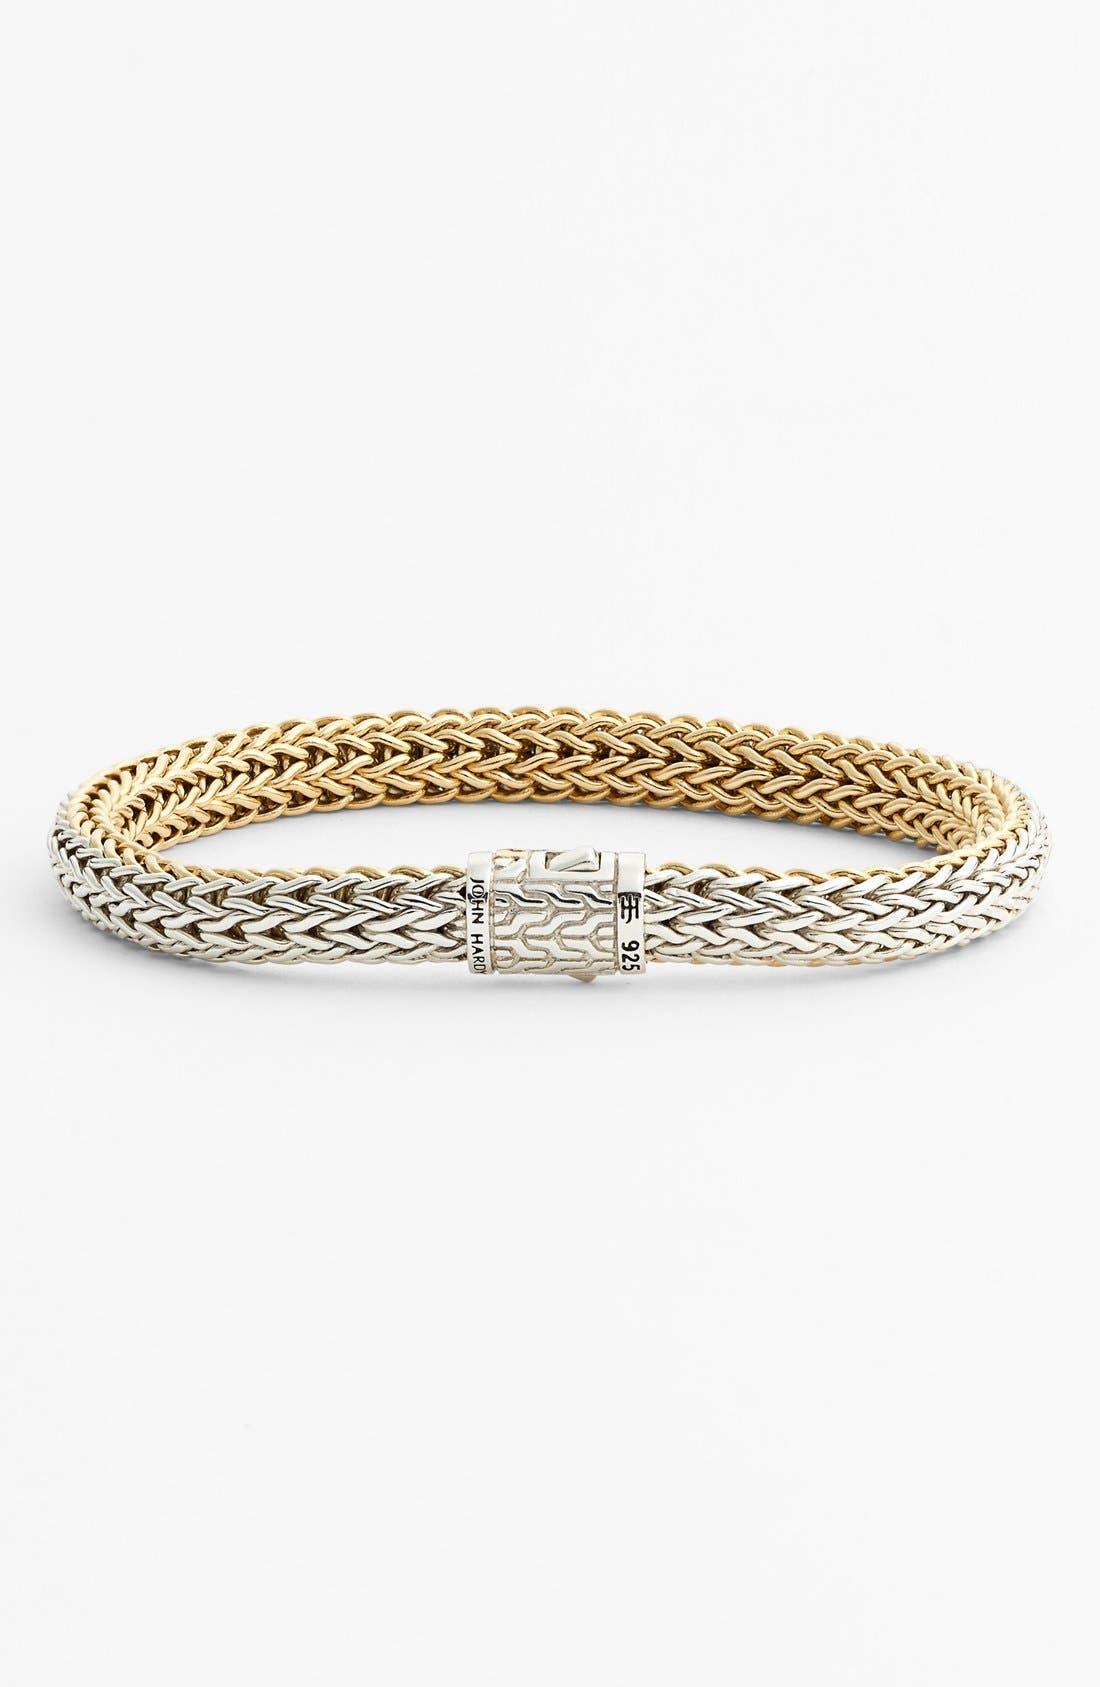 John Hardy 'Classic Chain' Small Reversible Bracelet